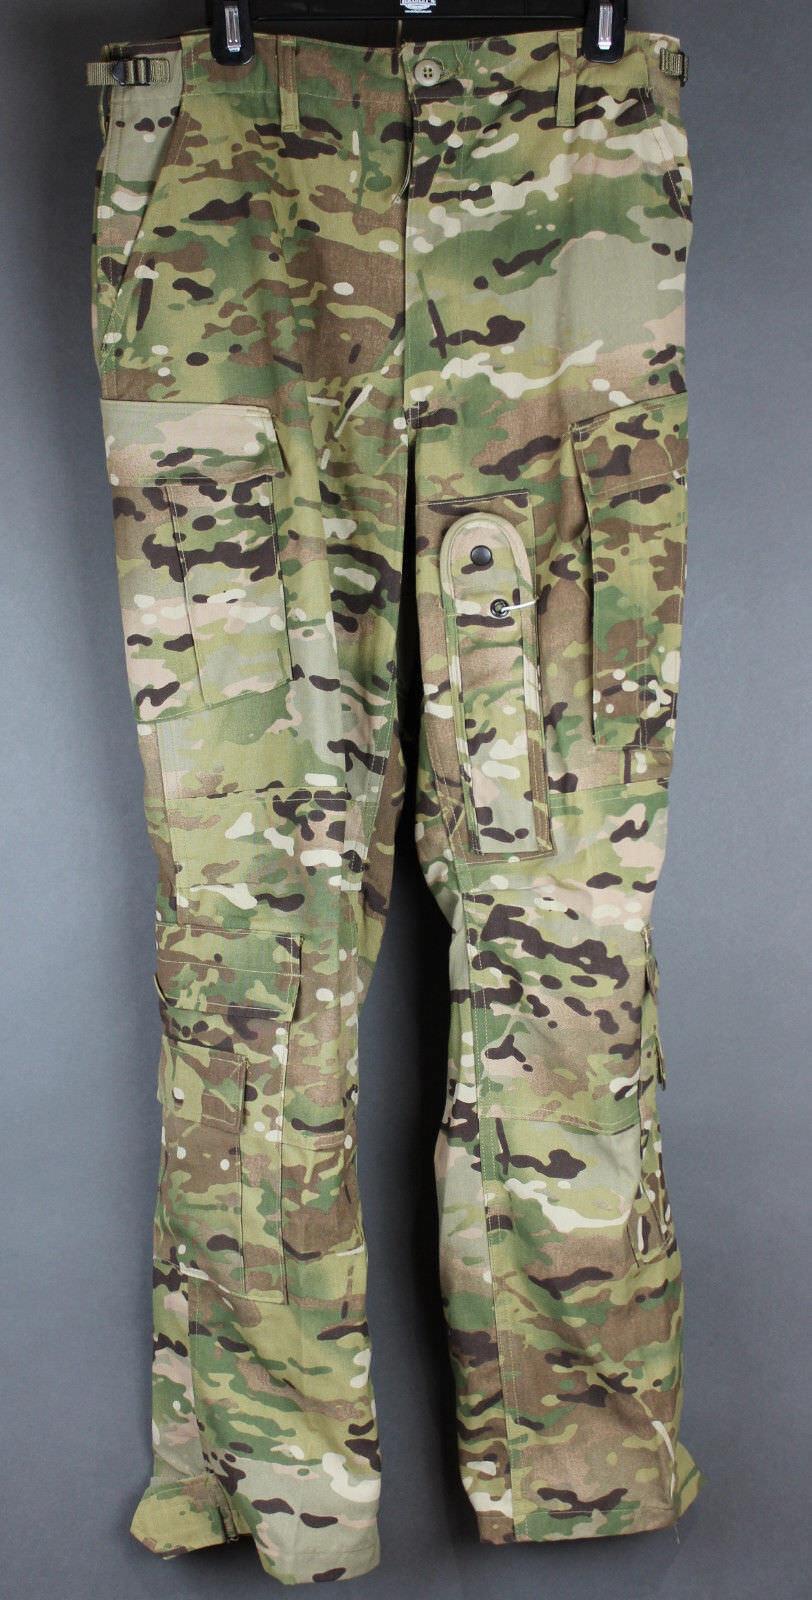 6dfacb57b54bb Details about EUC GI Genuine Multicam OCP Army Aircrew A2 Uniform Trousers  Pants, Asst. Sizes